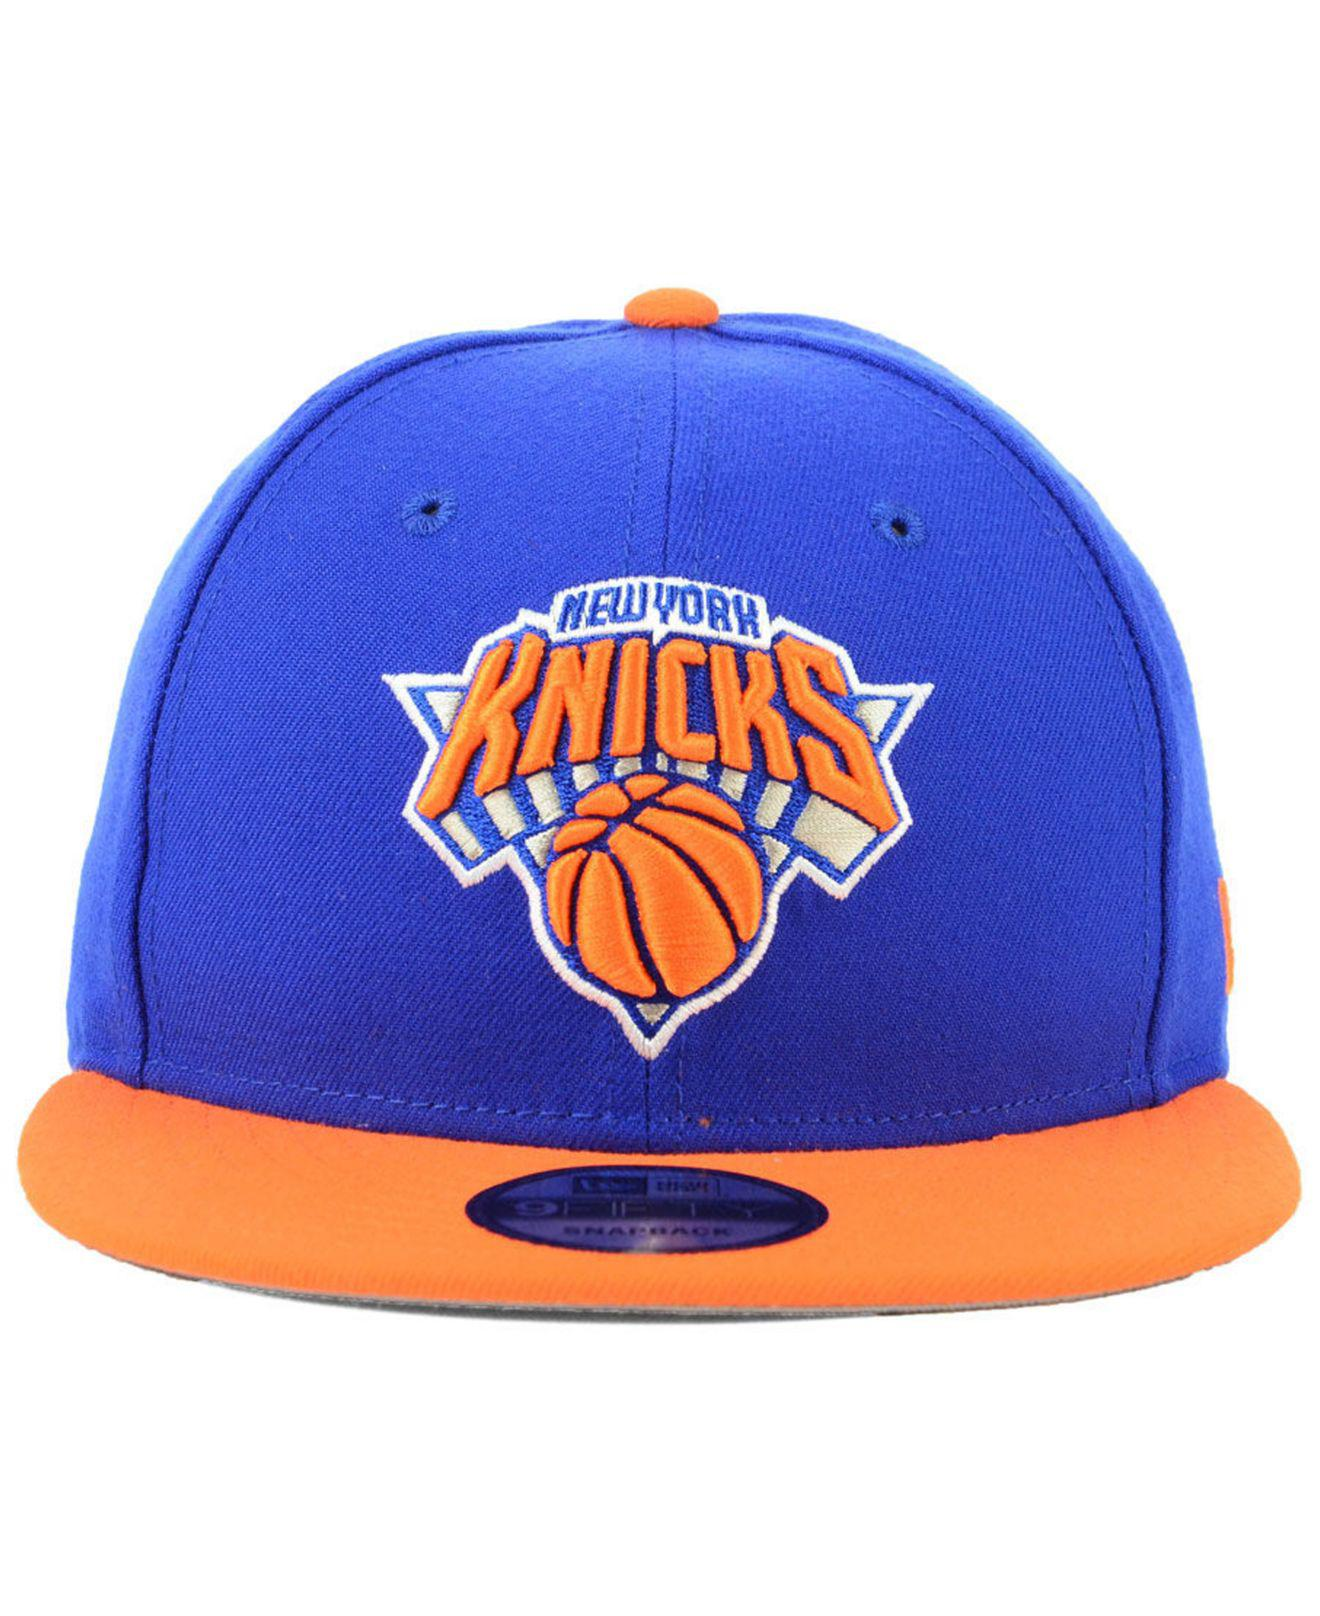 the best attitude ce9df d2052 ... where to buy lyst ktz new york knicks basic 2 tone 9fifty snapback cap  in orange